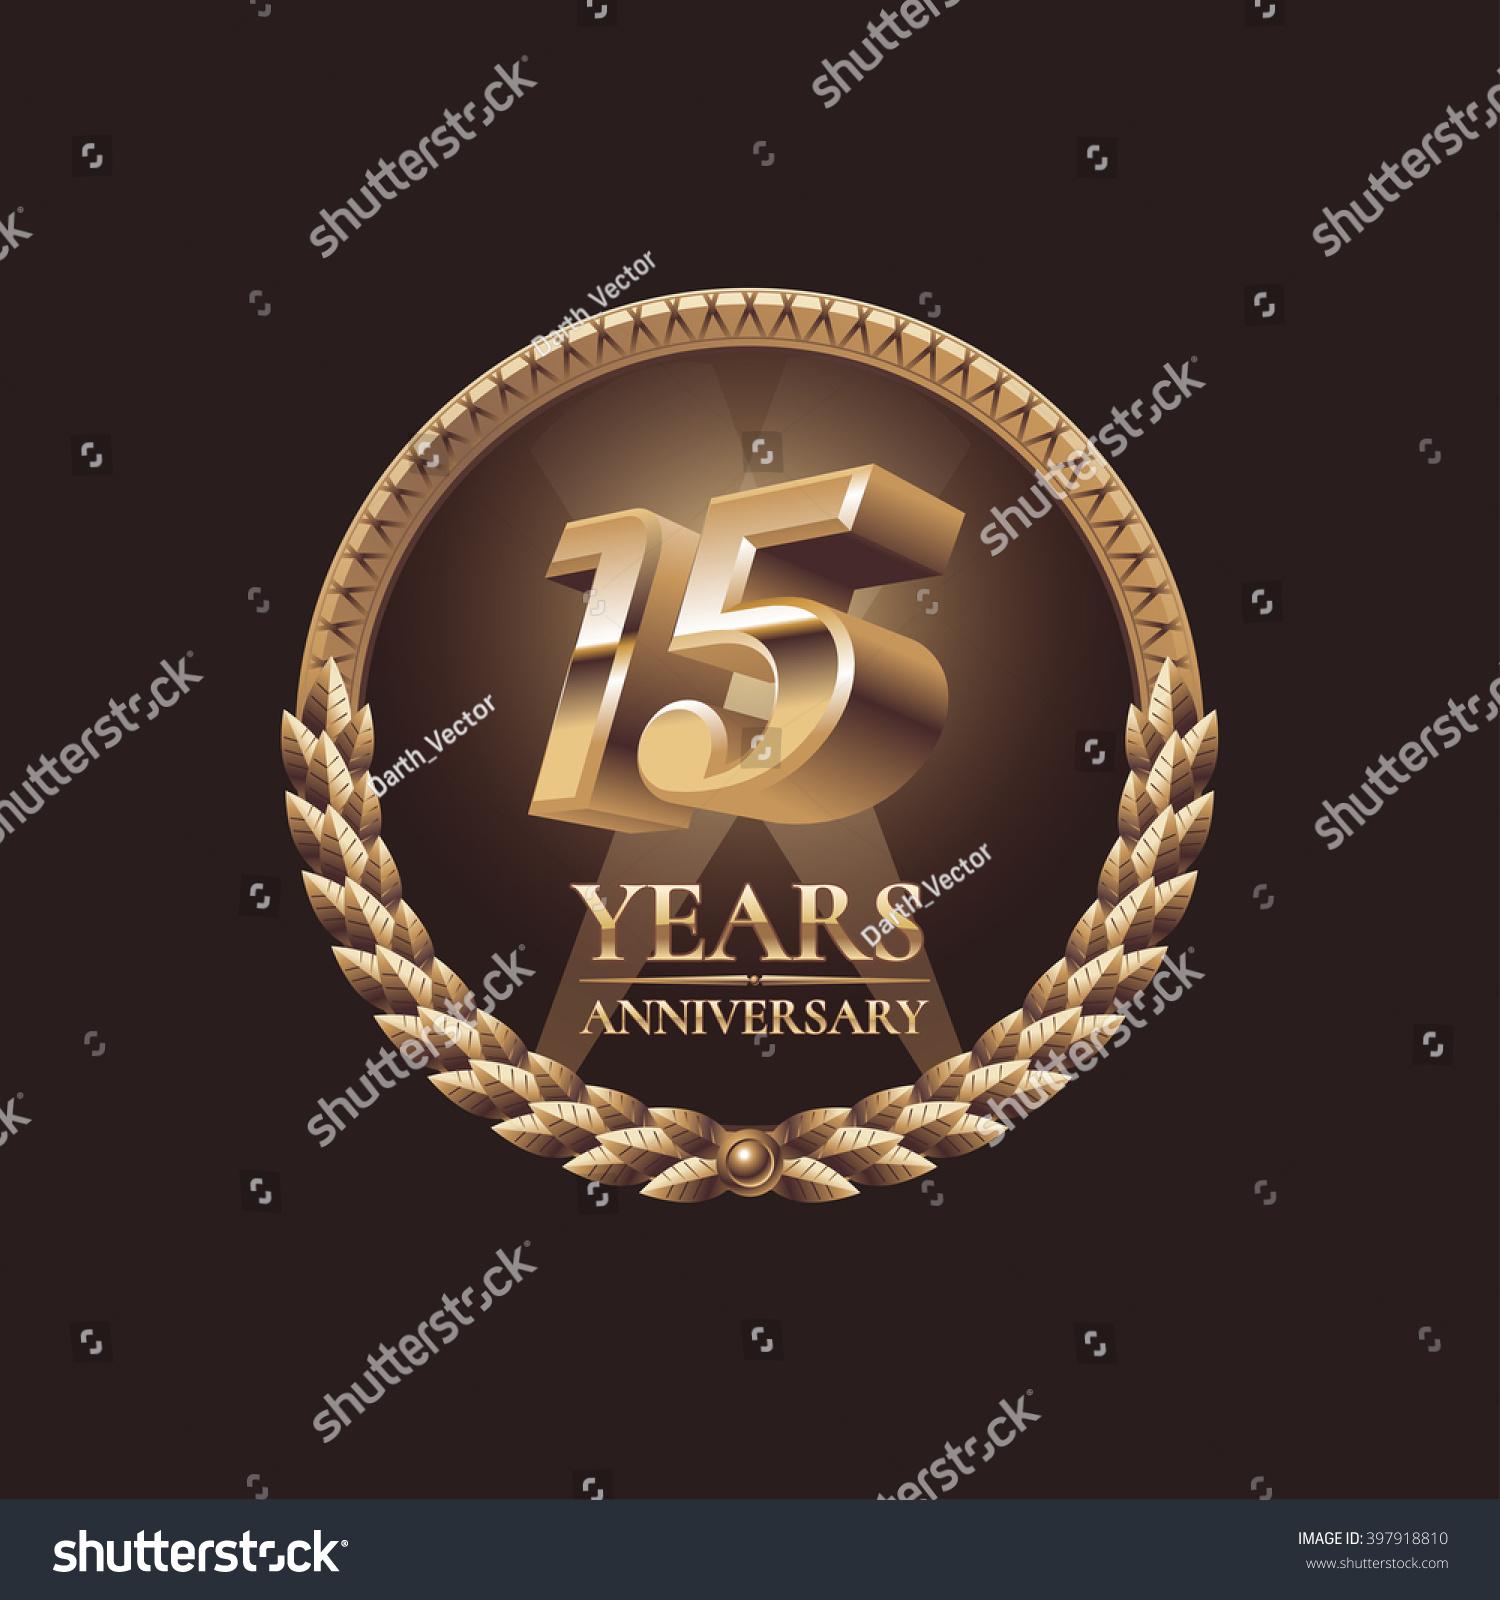 15 Years Anniversary Vector Icon Symbol Stock Vector Royalty Free